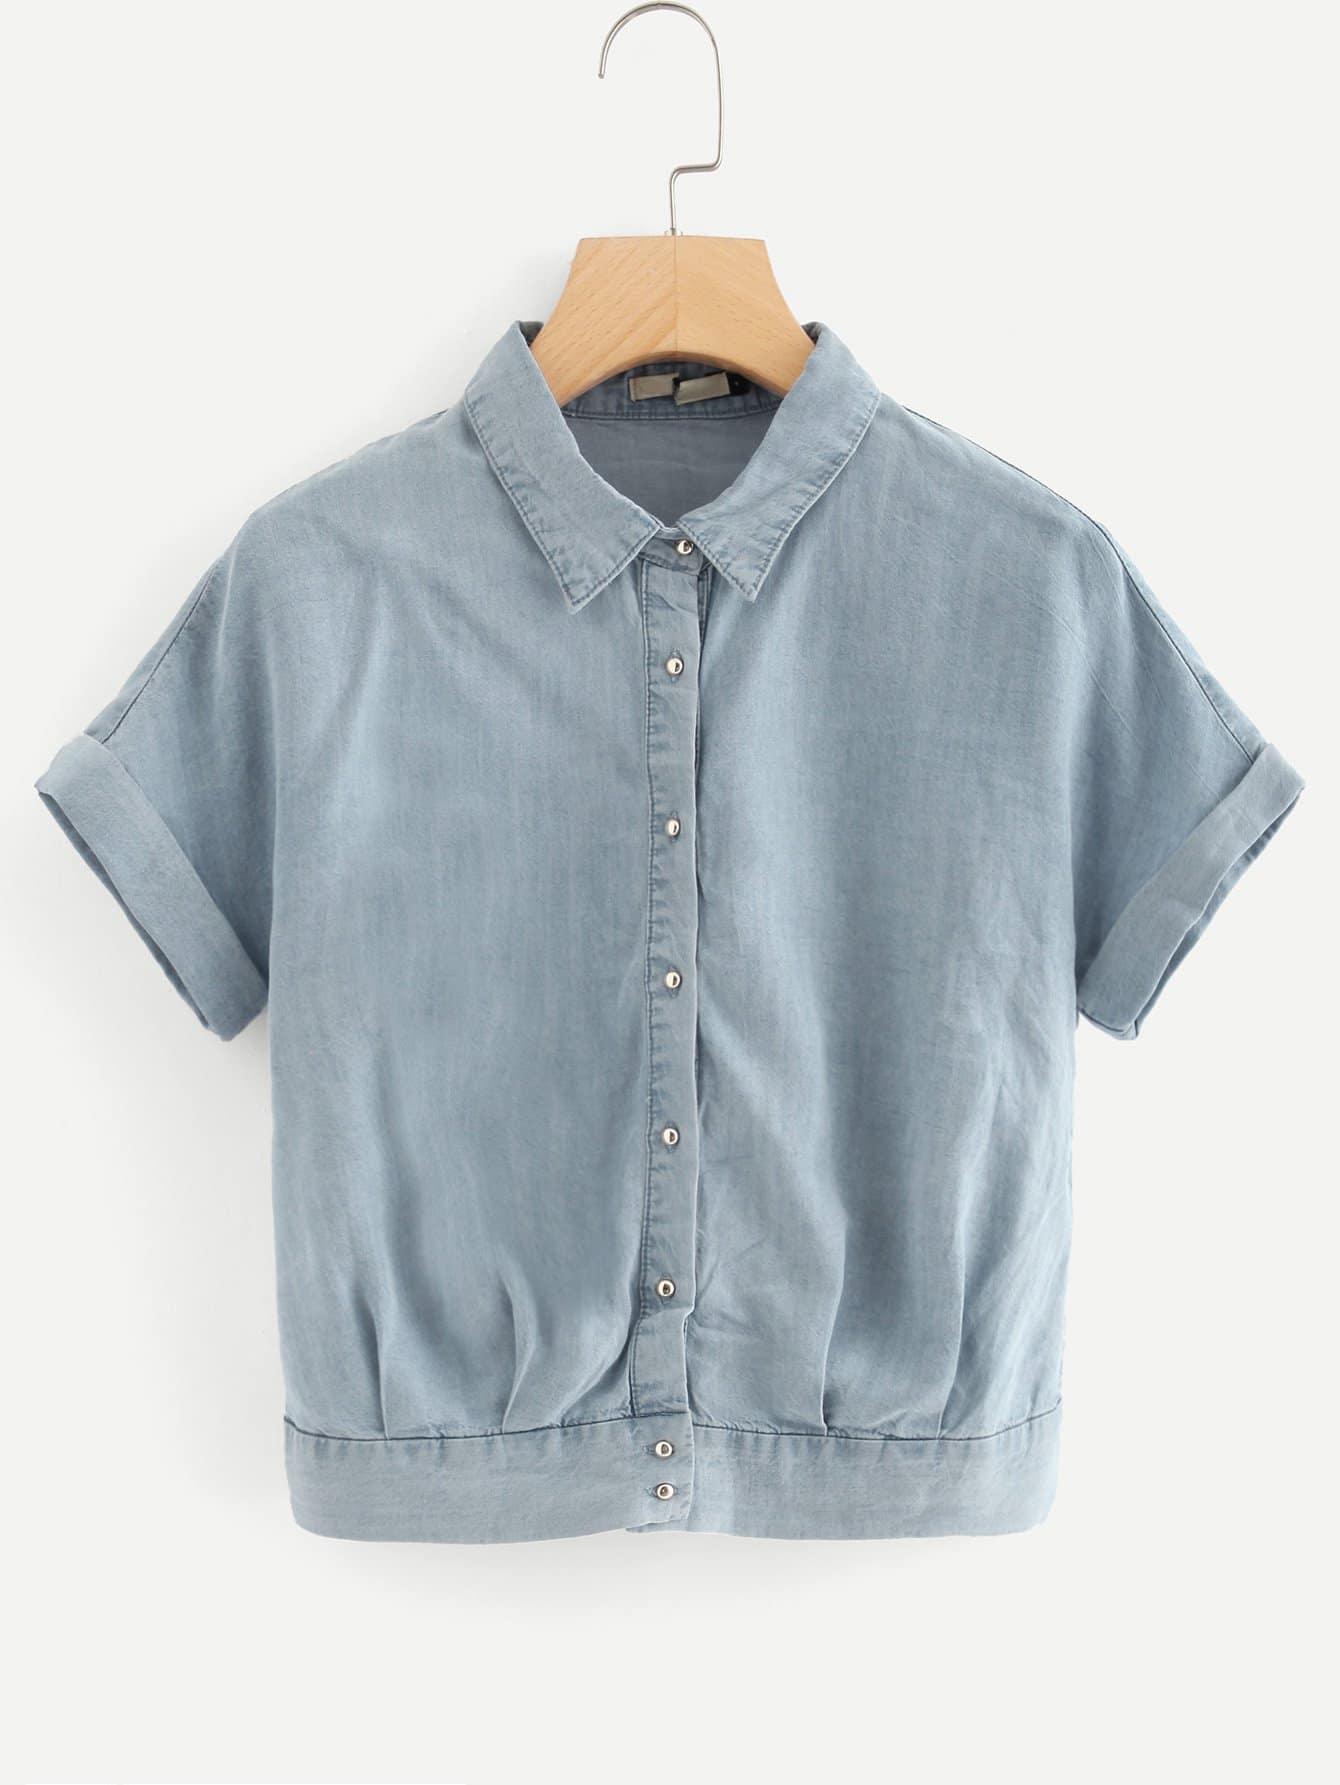 Solid Button Denim Top long sleeve button up denim top denim